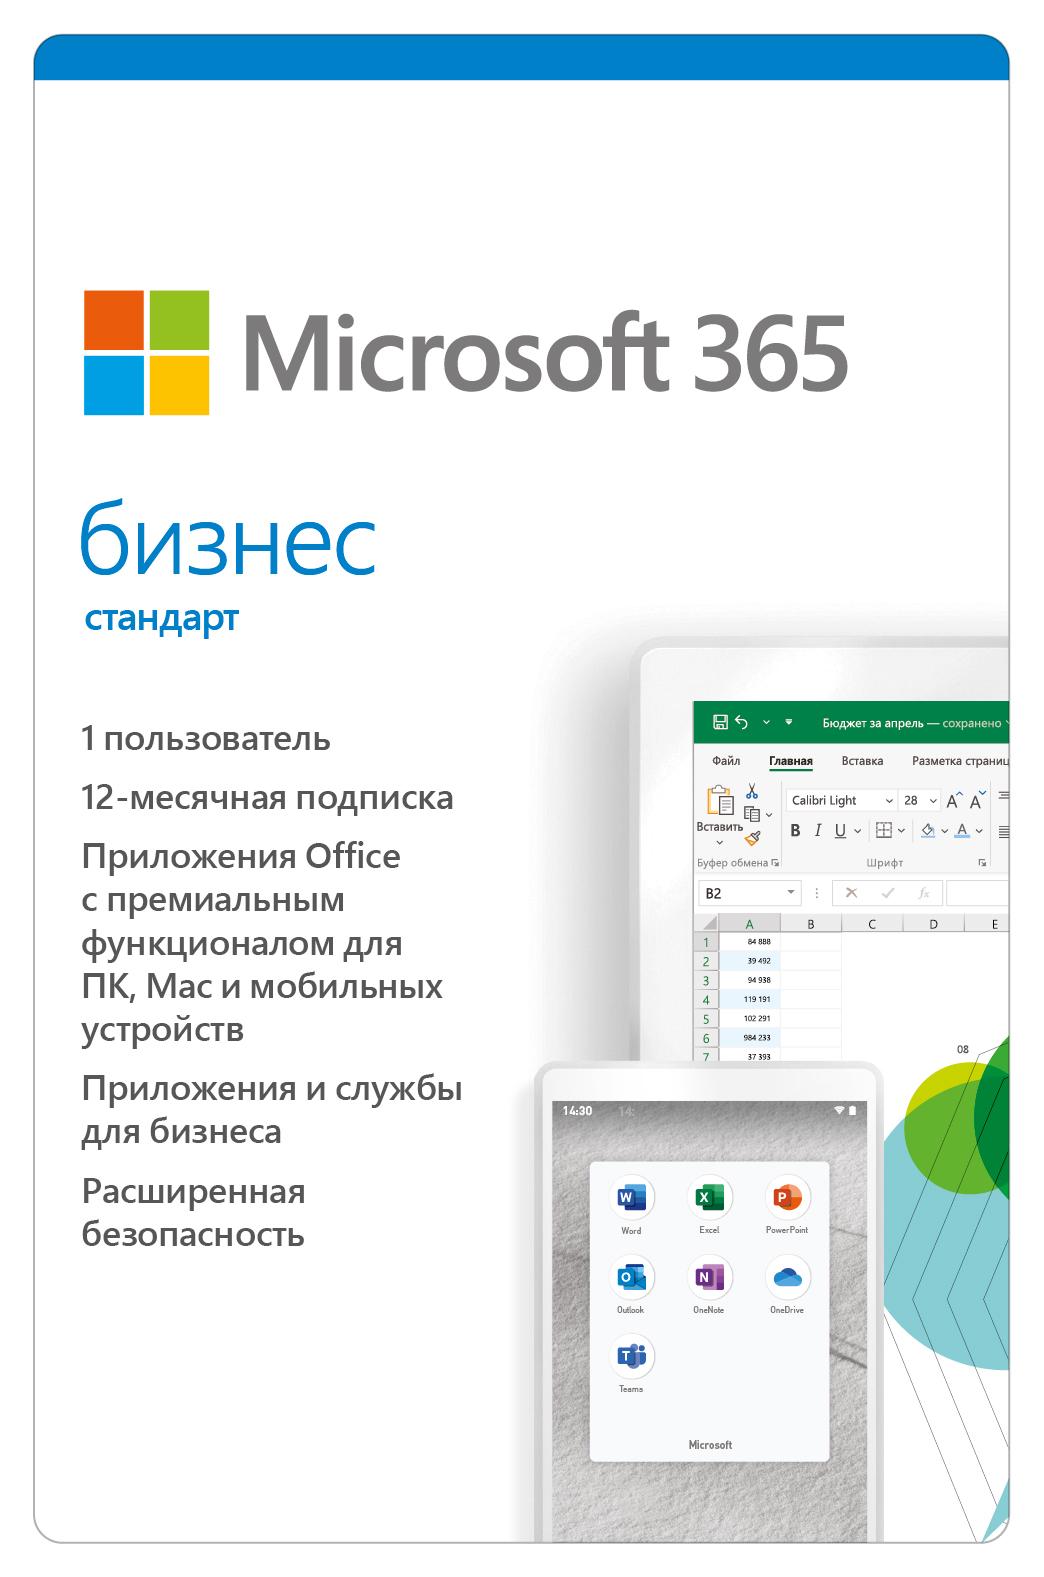 Microsoft 365 Бизнес Стандарт. Мультиязычная лицензия [PC, Цифровая версия, 1 ПК / 1 год] (Цифровая версия)